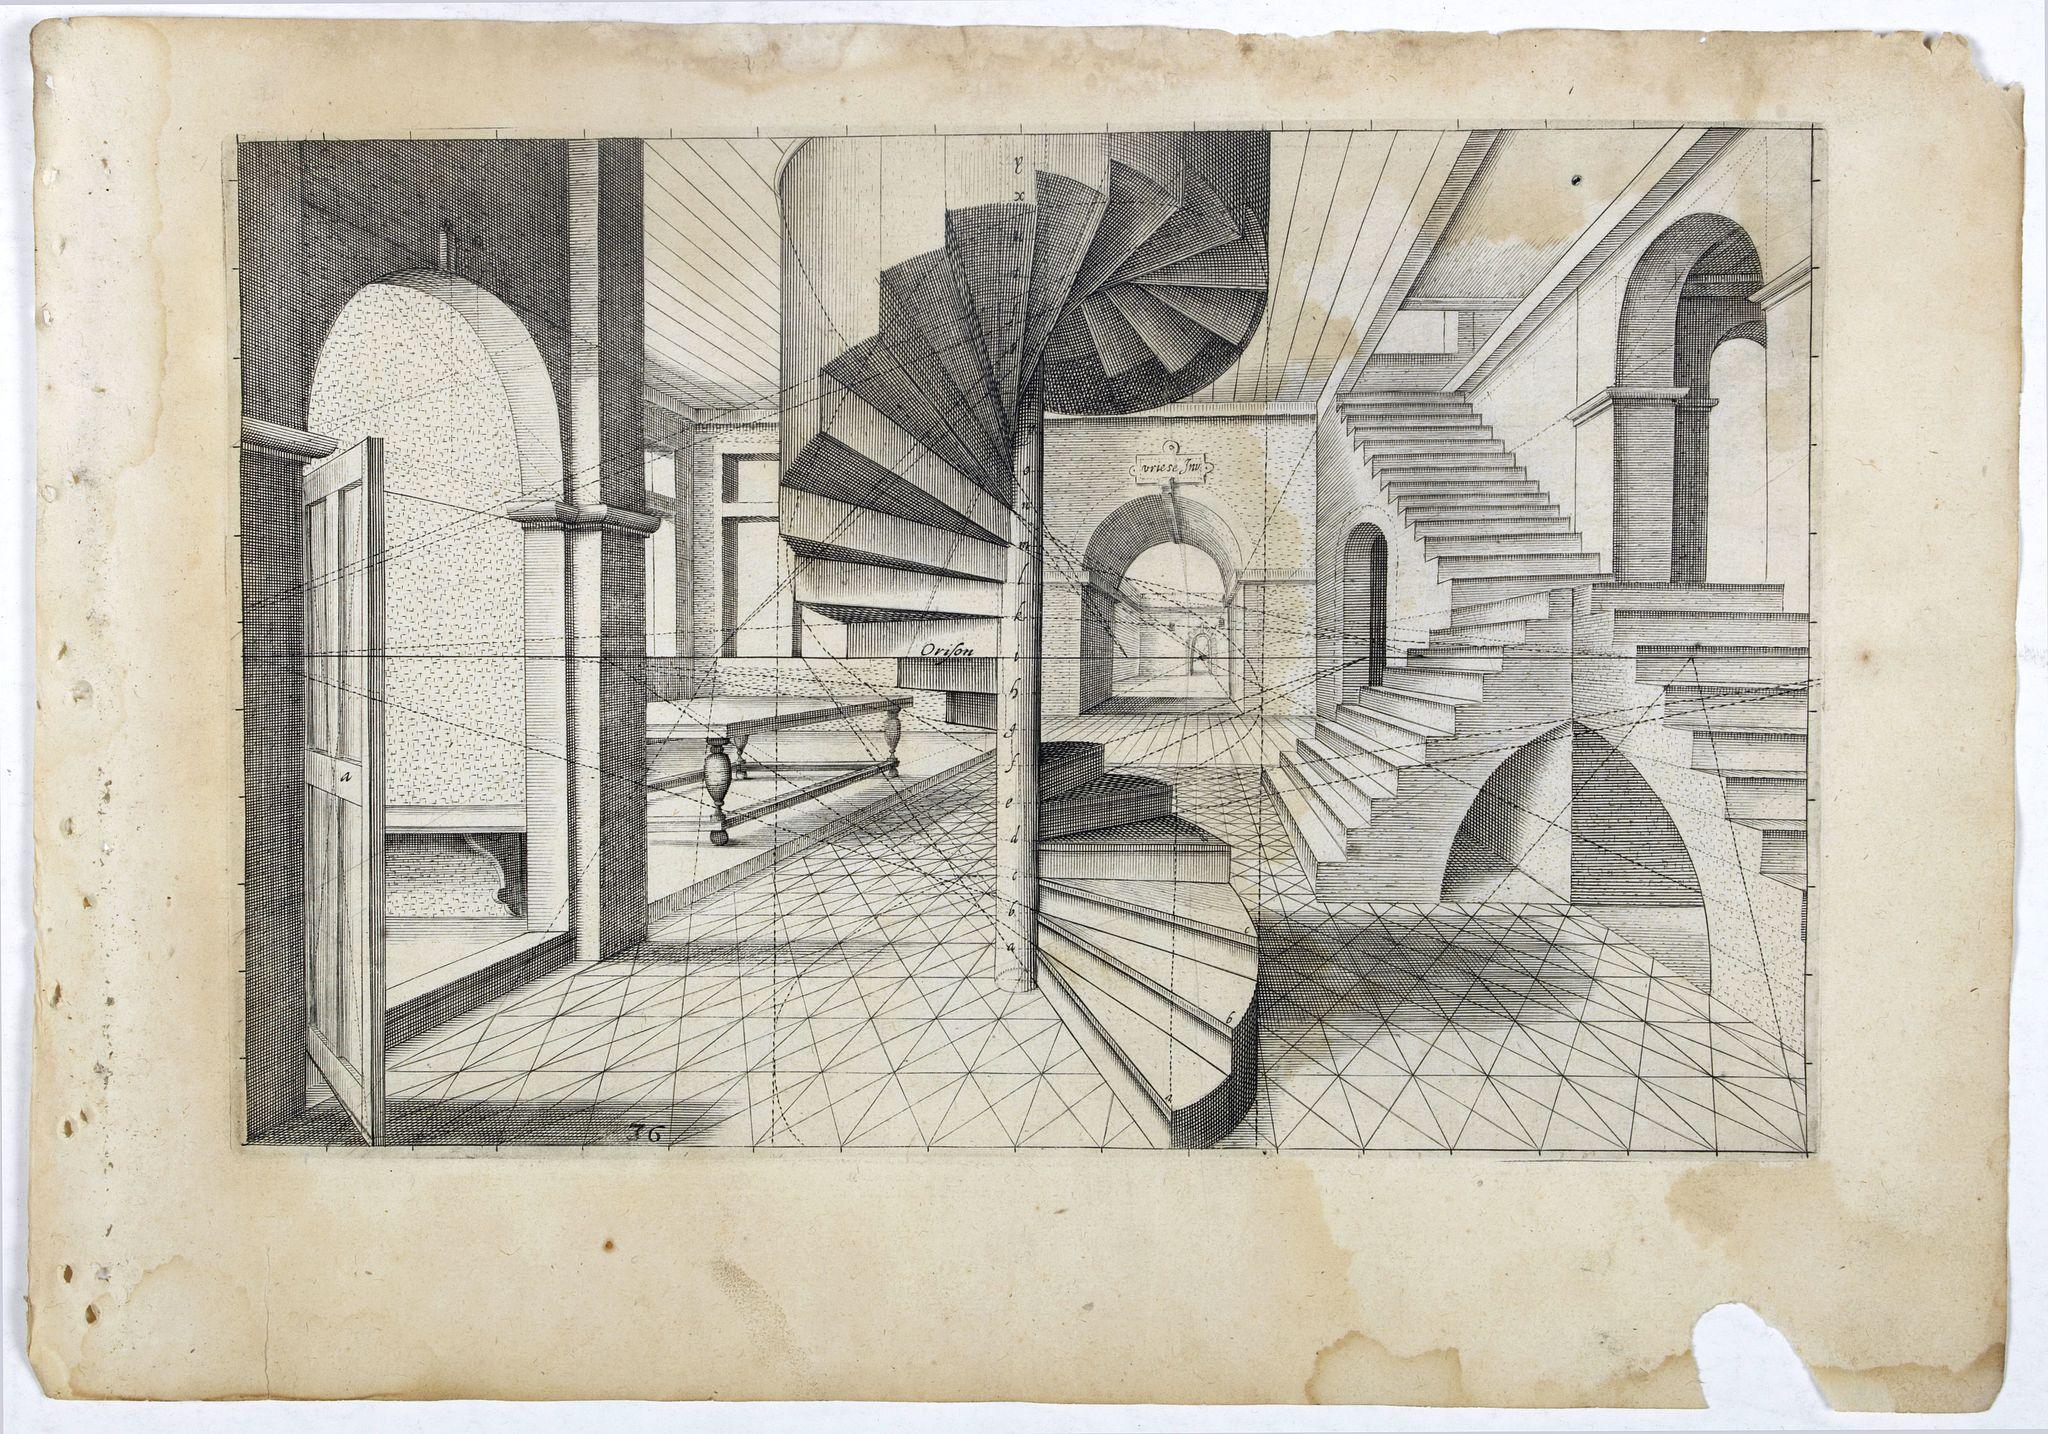 VREDEMAN DE VRIES, J. / HONDIUS, H. -  Perspective print by Vredeman de Vries. 36.